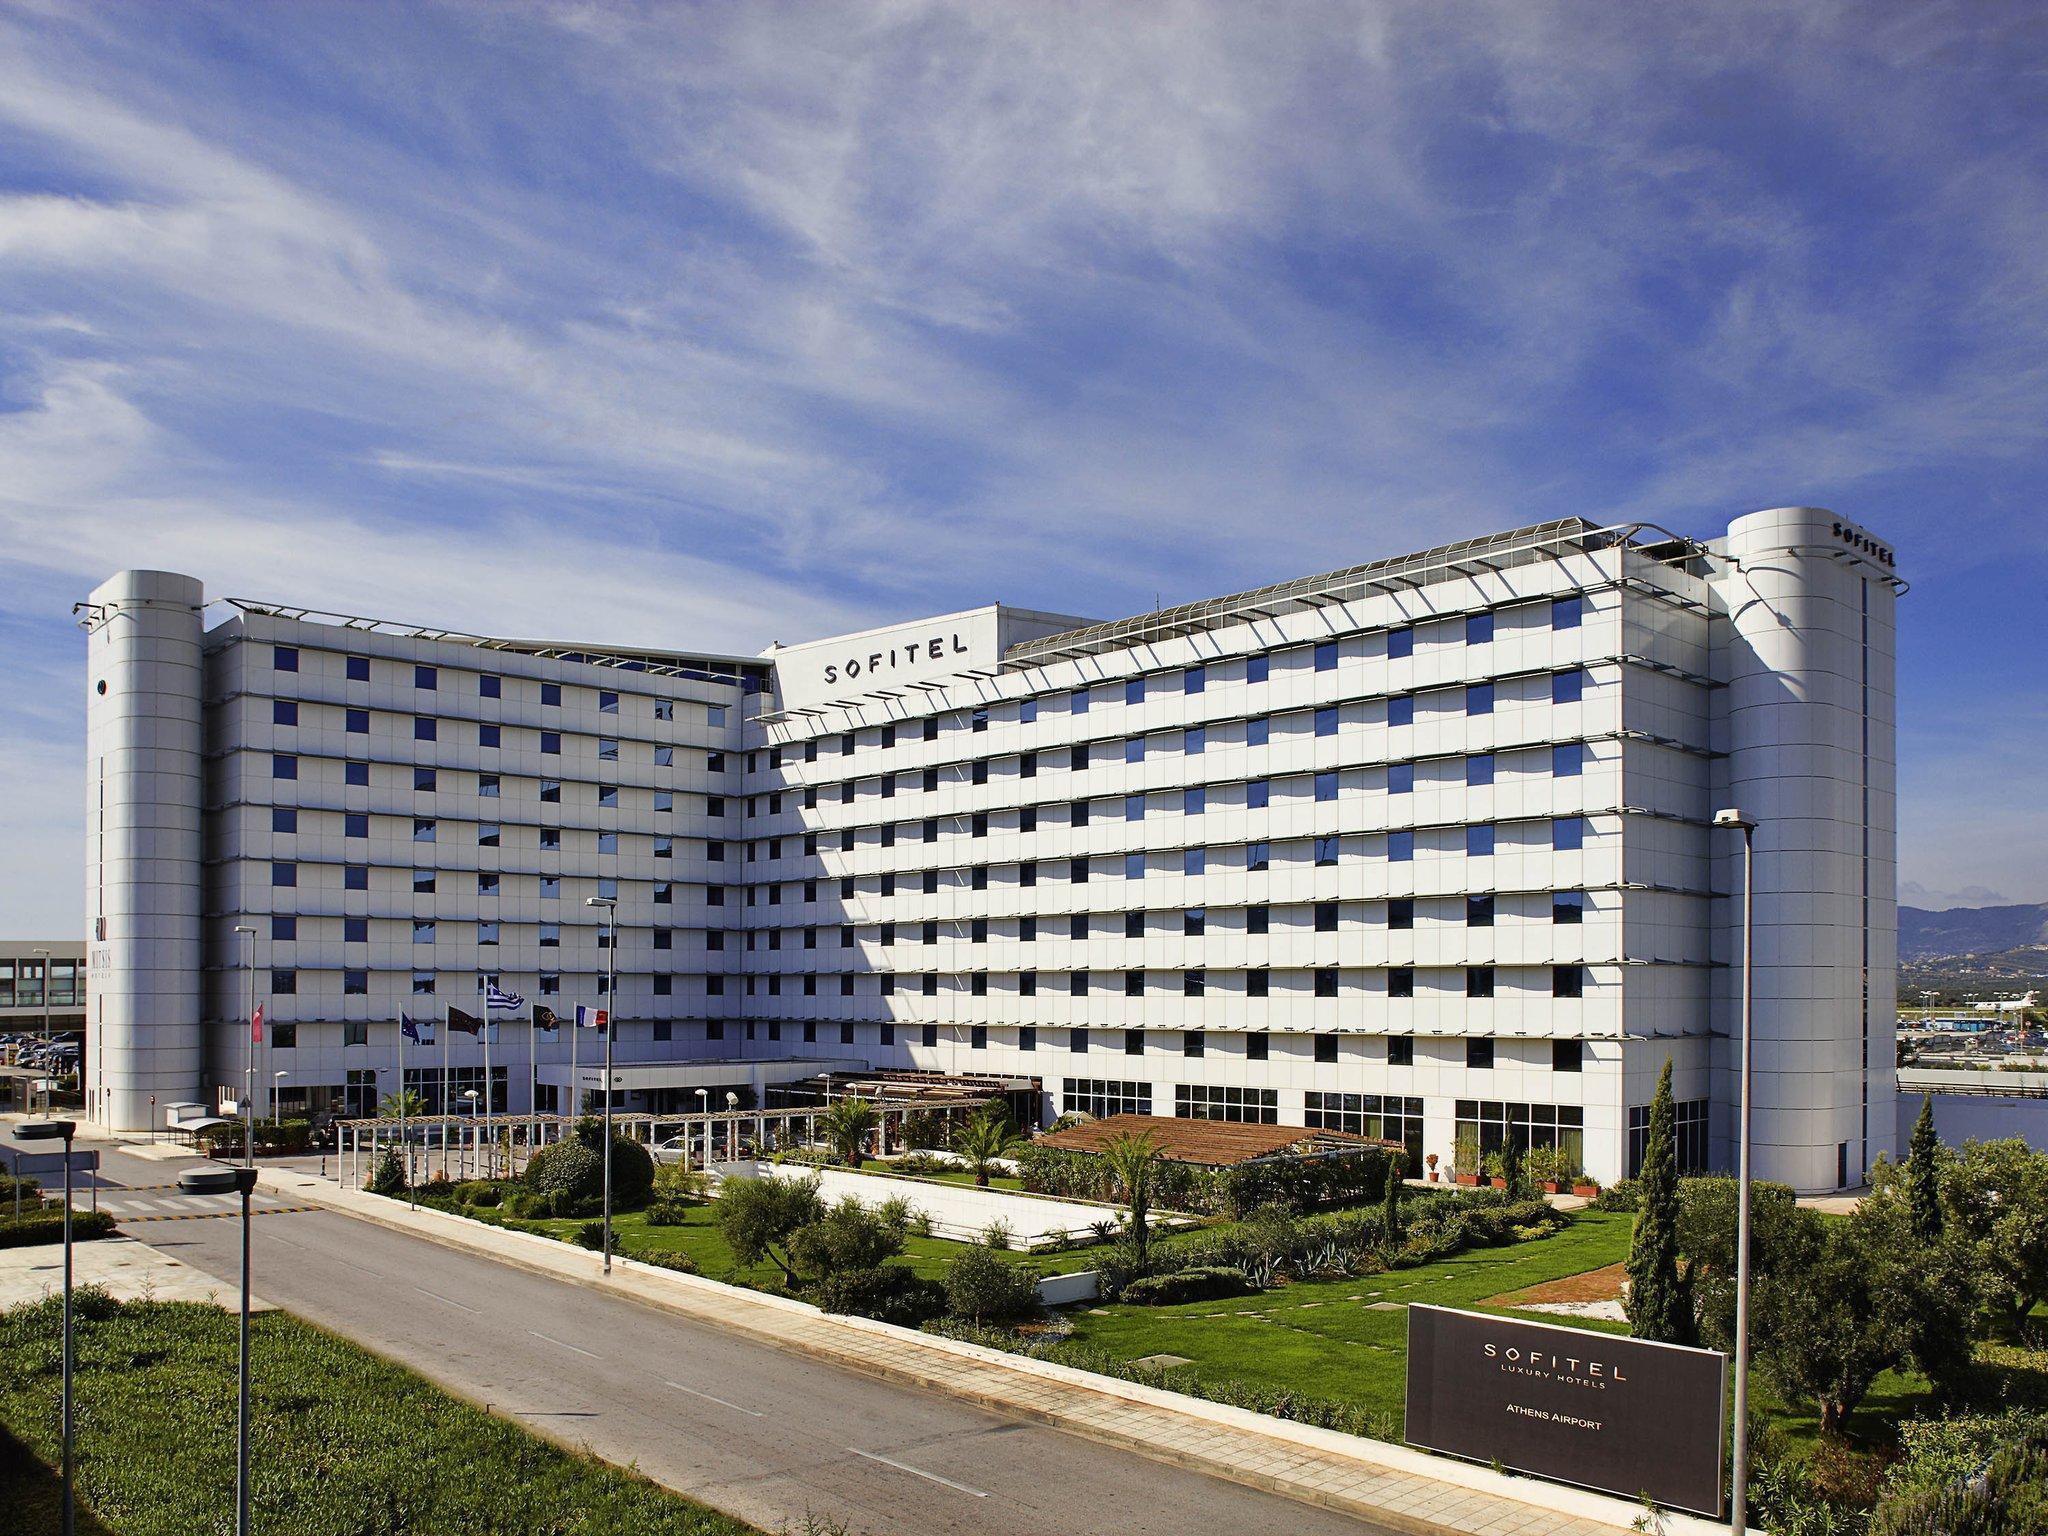 Sofitel Athens Airport Hotel